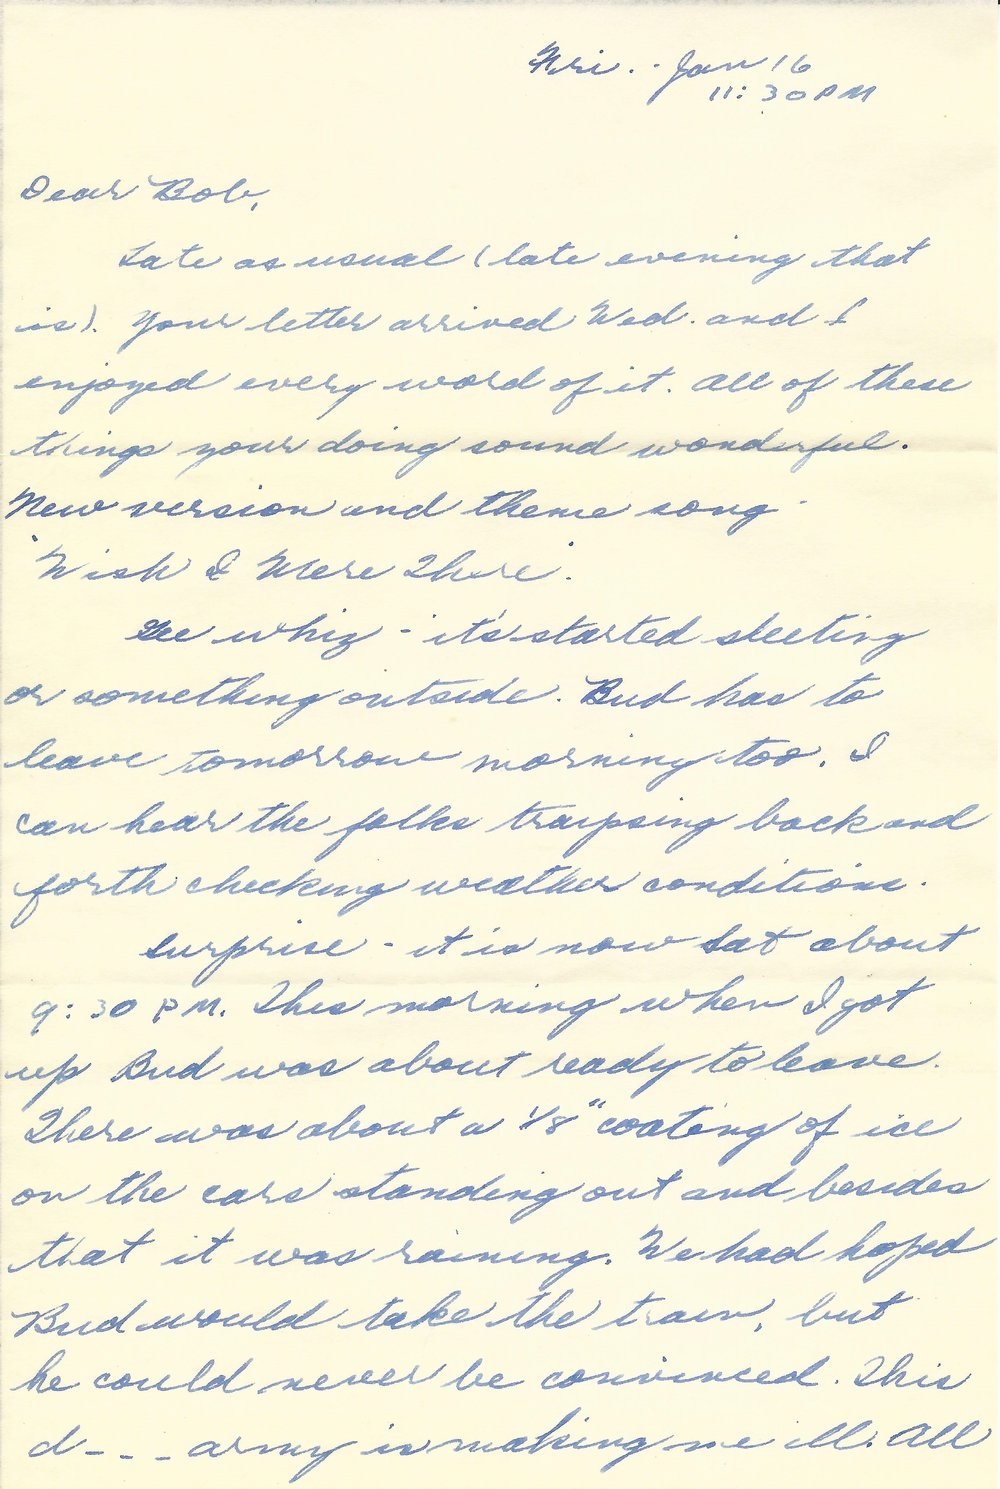 8. Jan. 16, 1953 (Oma)_Page_2.jpg